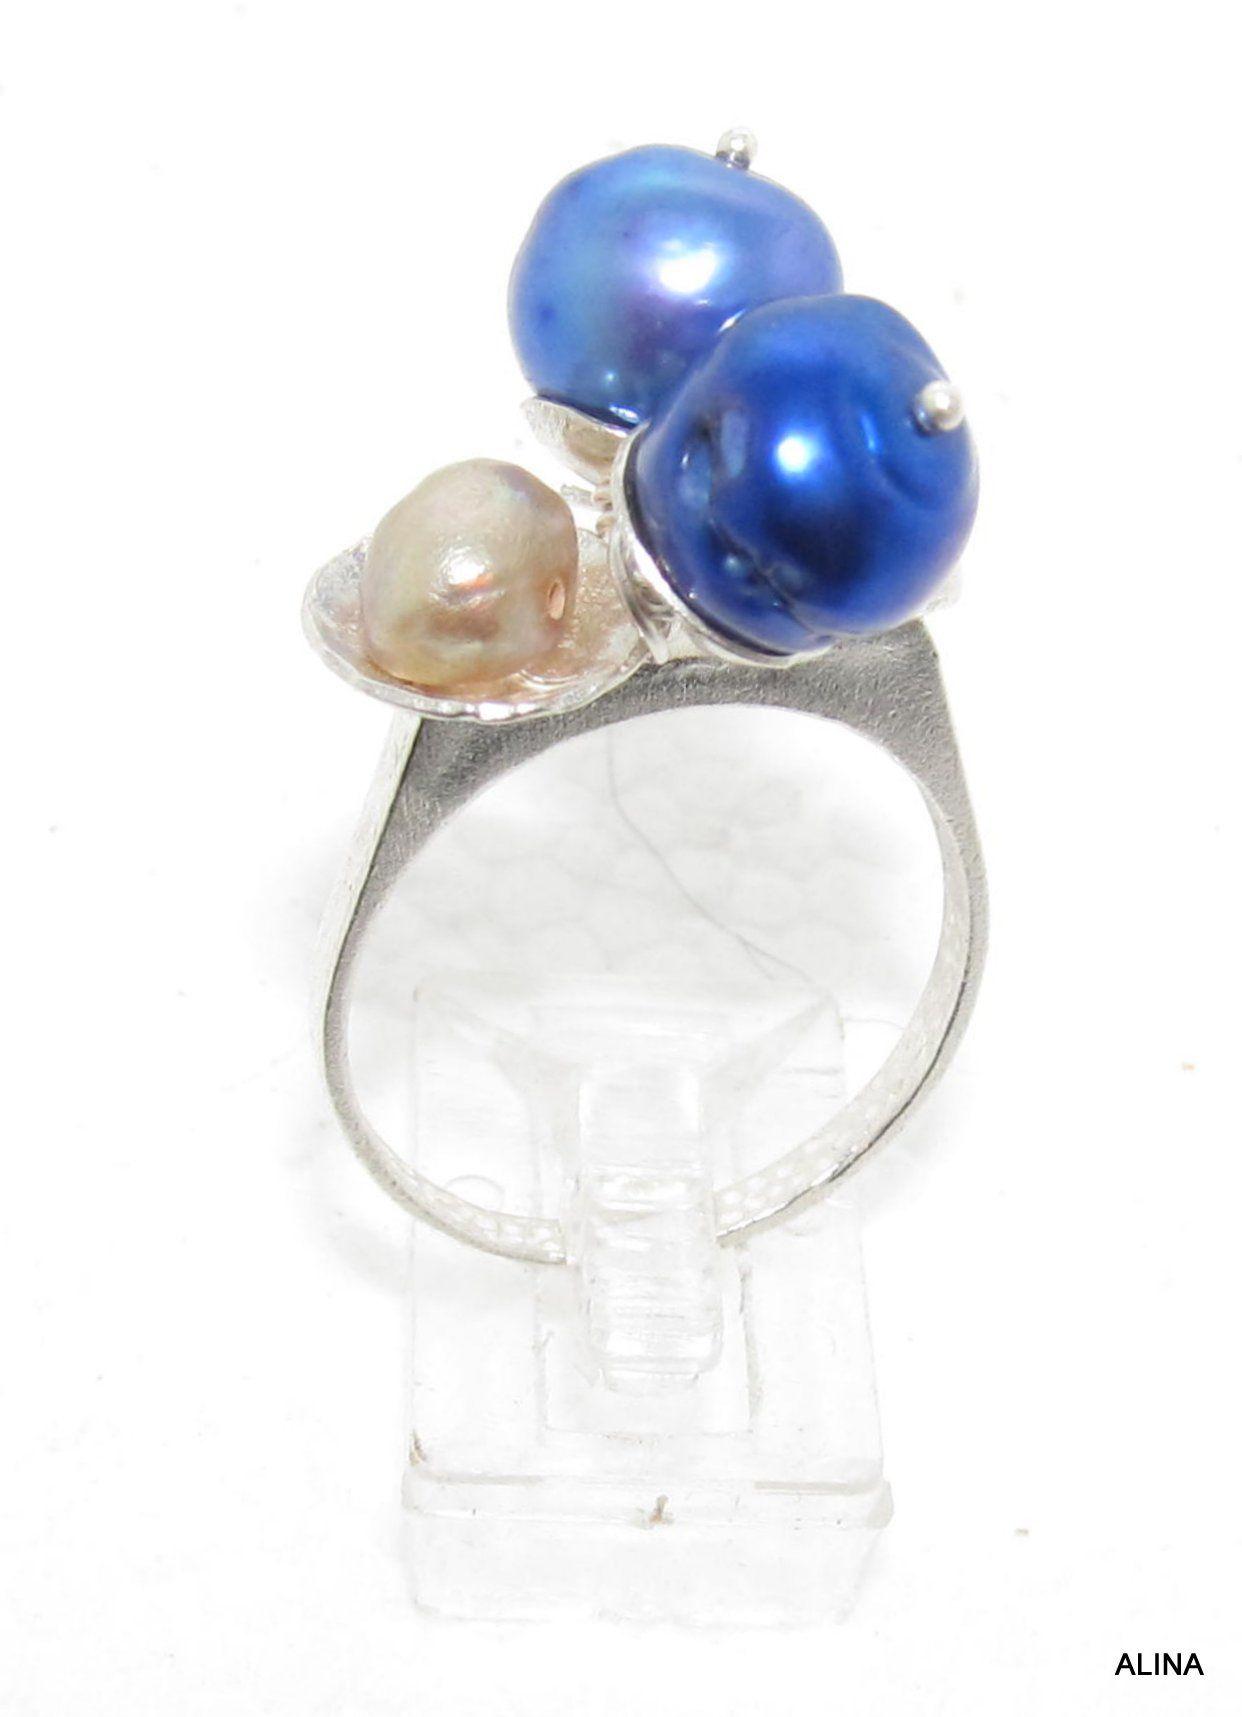 ANILLO de ALINA MARTÍNEZ PERDOMO, con perlas de agua dulce